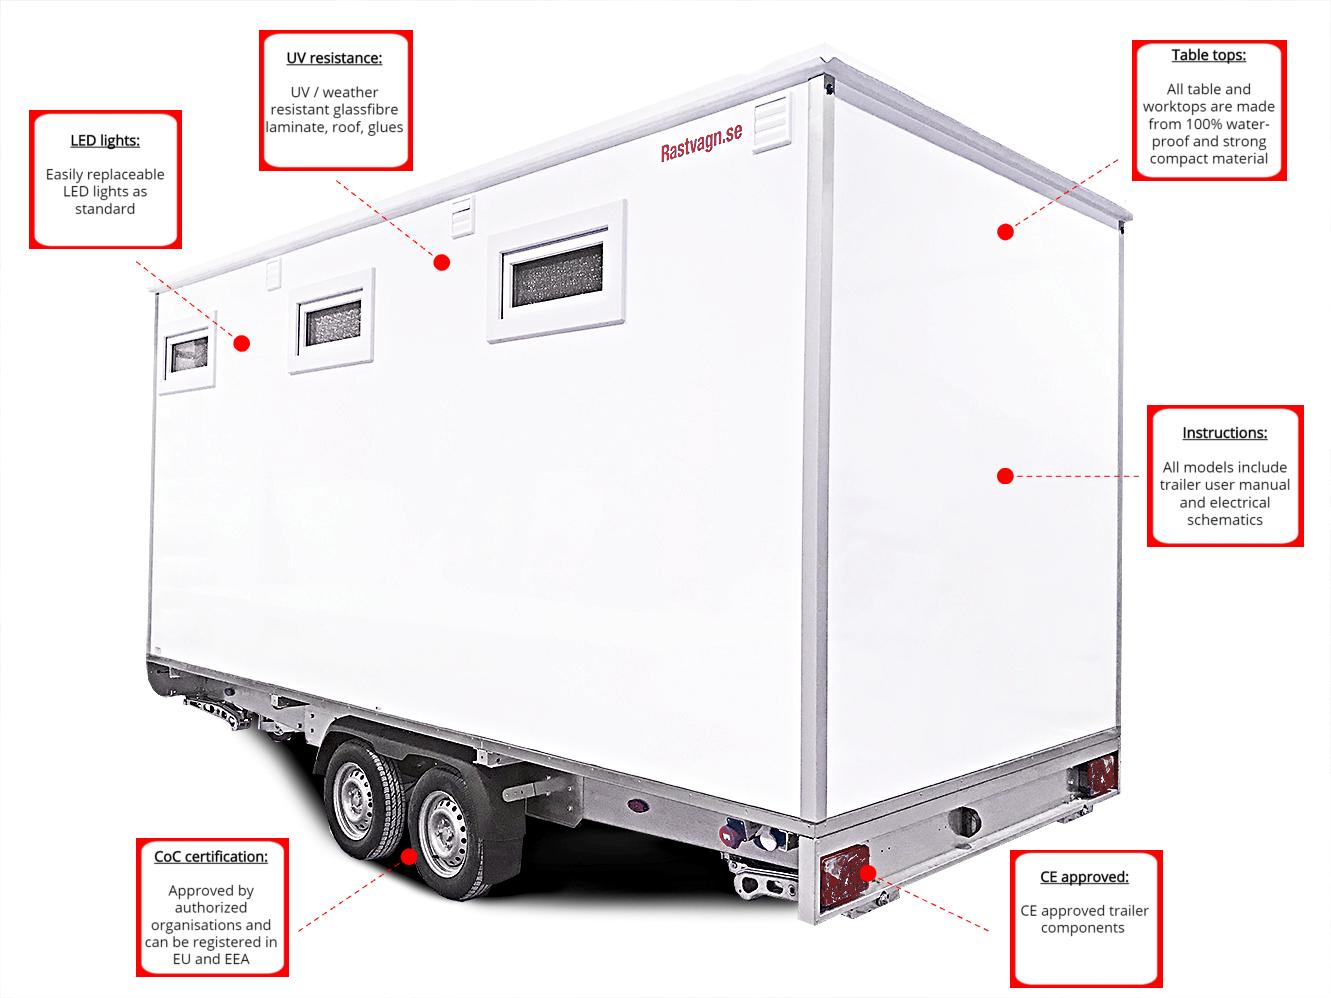 Dusch /toavagn 3P Delux